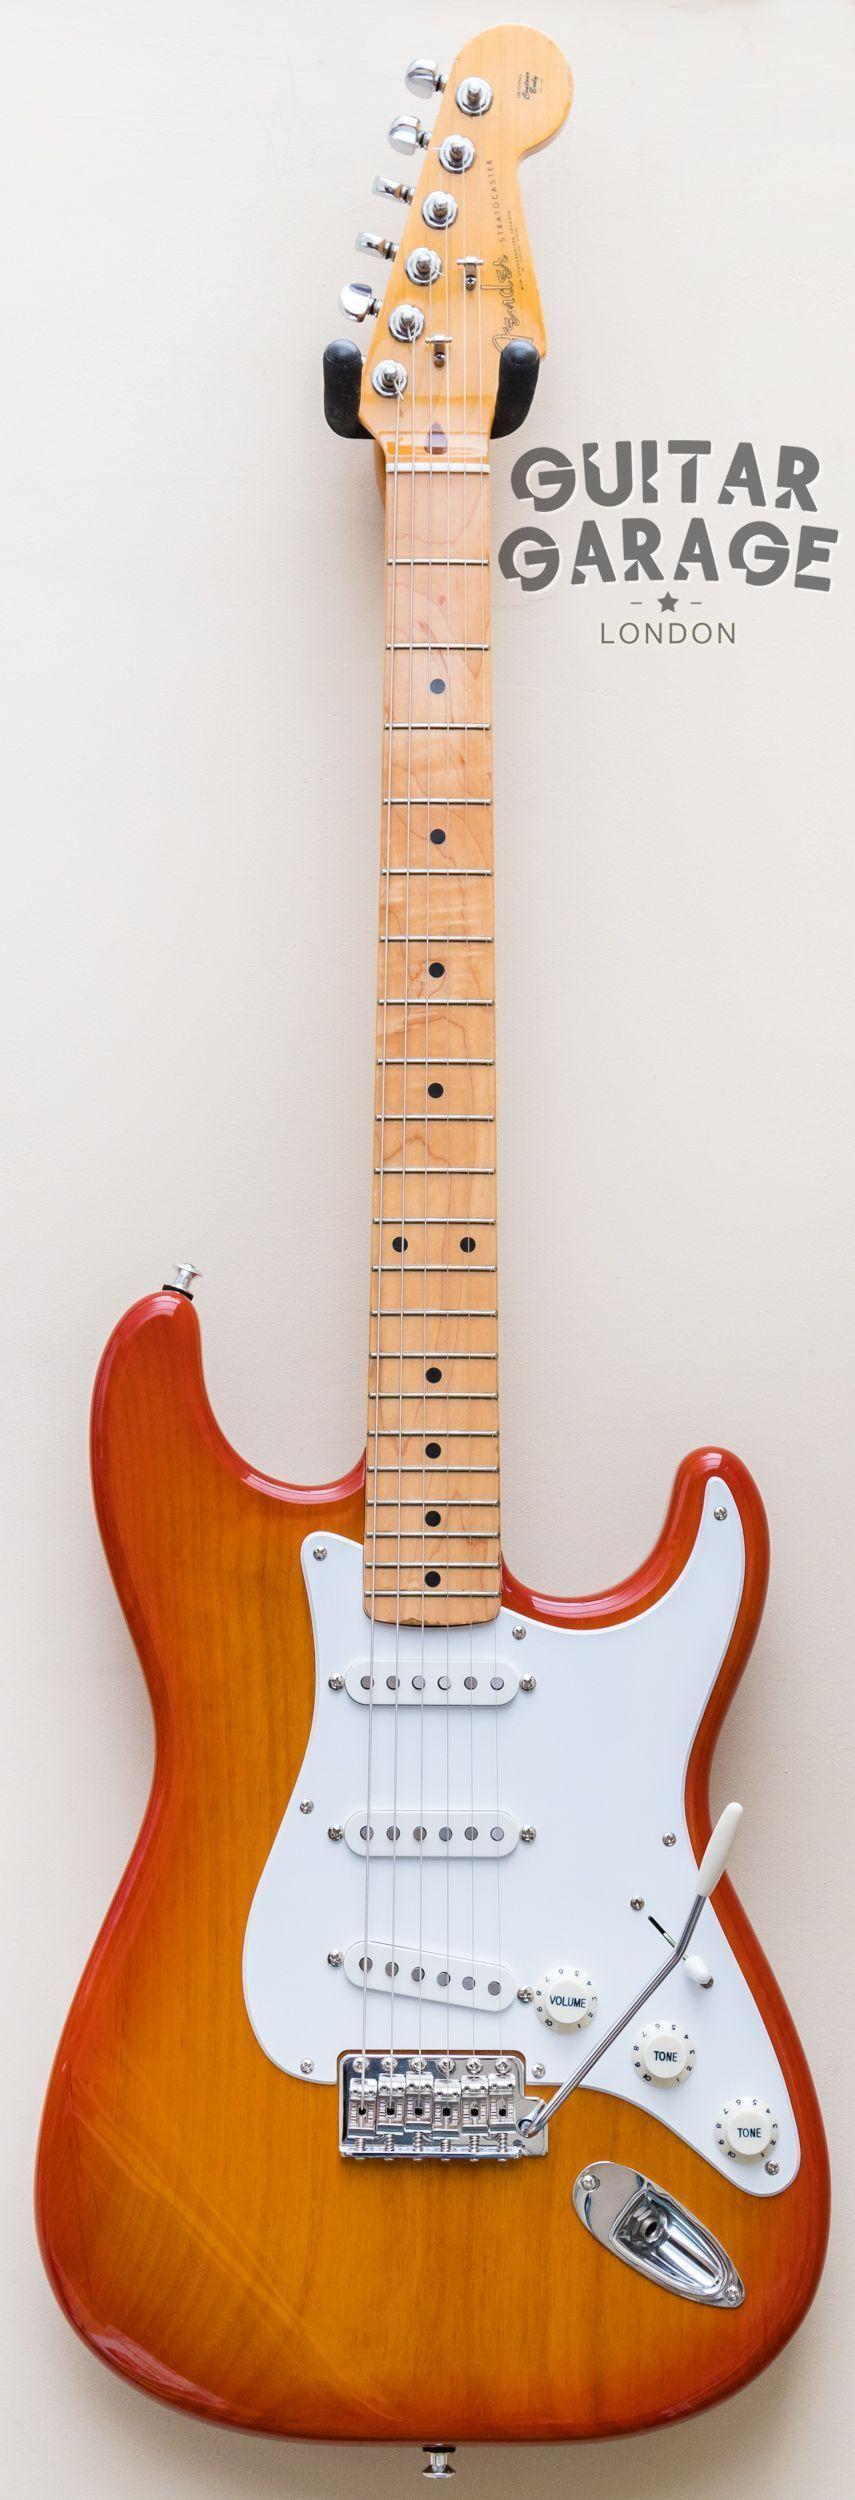 Fender Stratocaster Sienna Burst '59